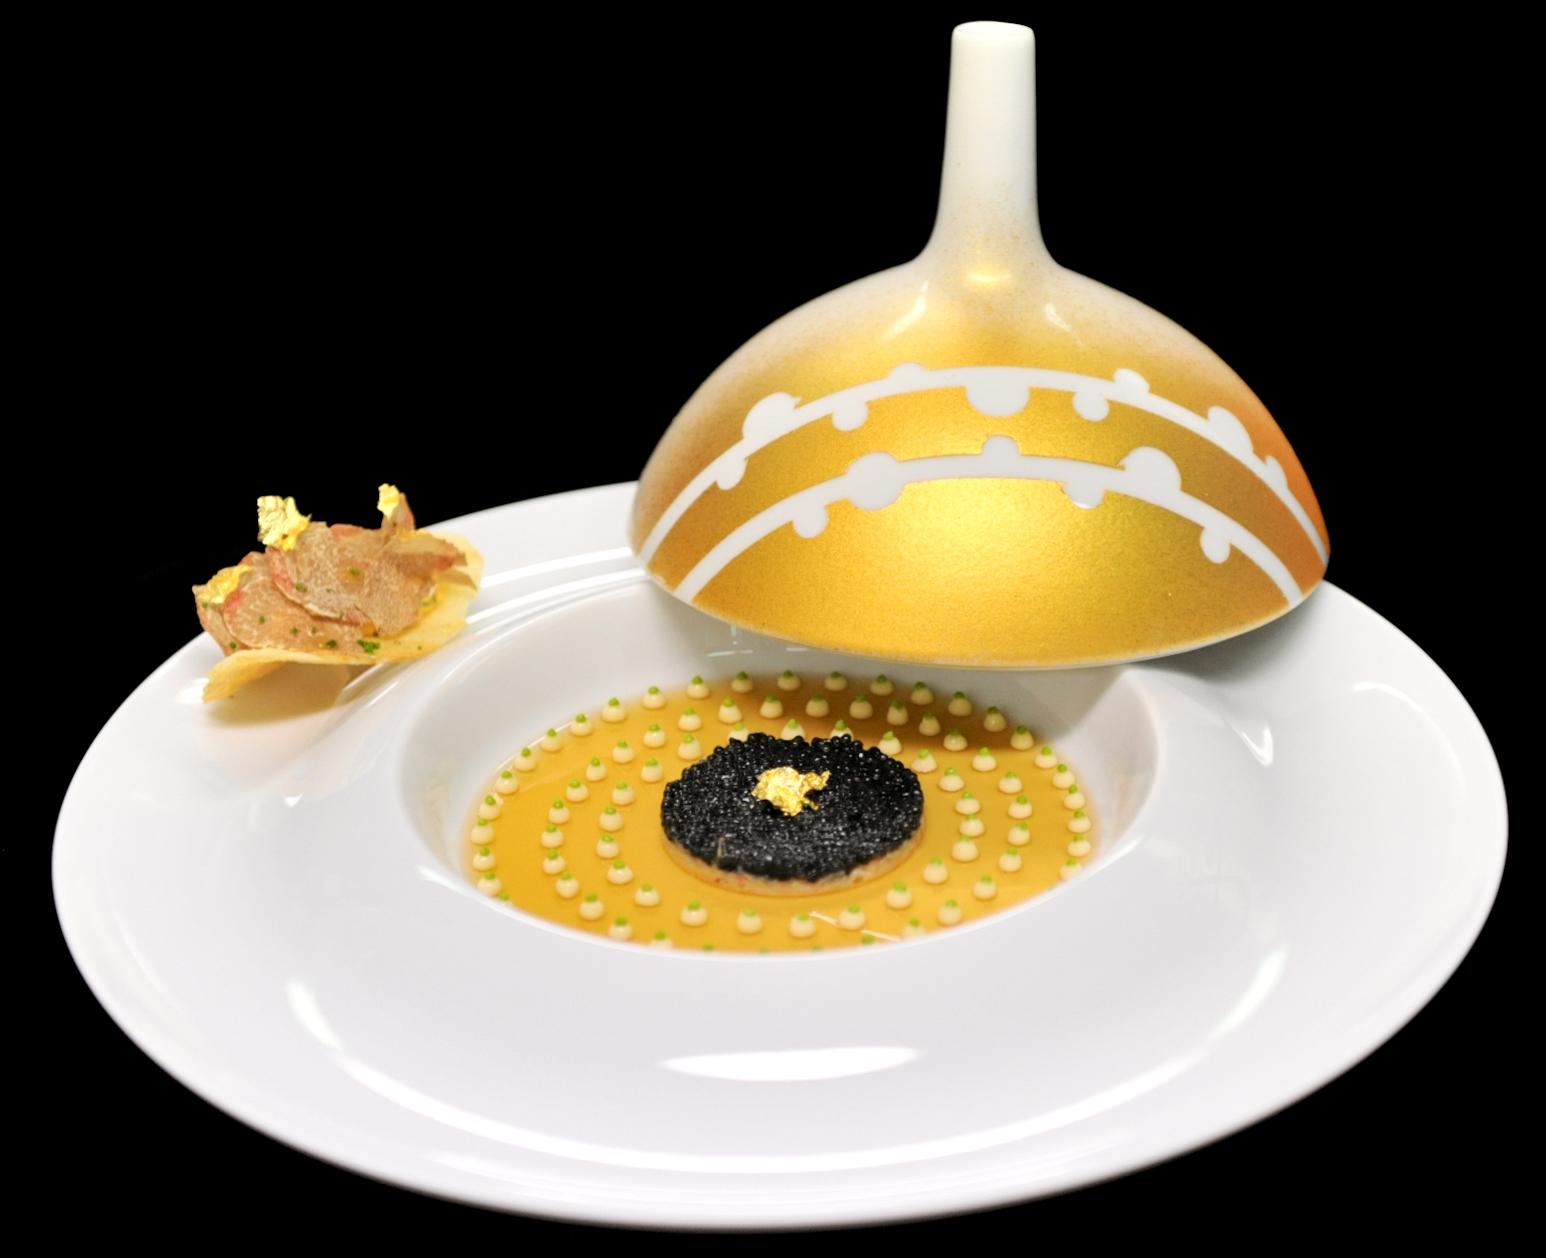 Beautiful presentation of caviar